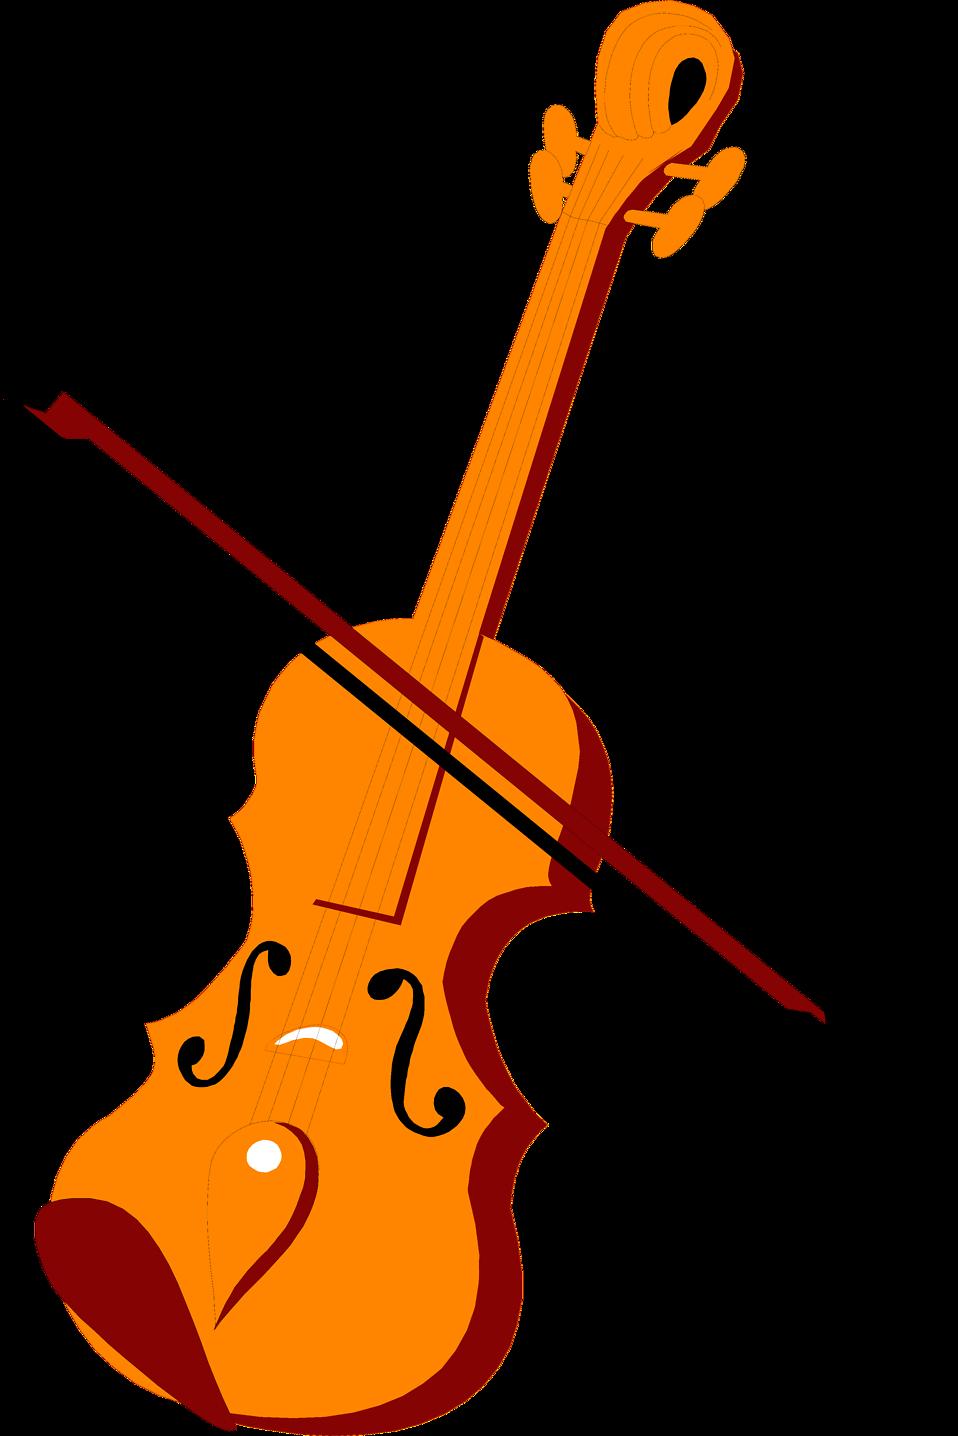 Violin Bow Clipart Violin bow clipart - C...